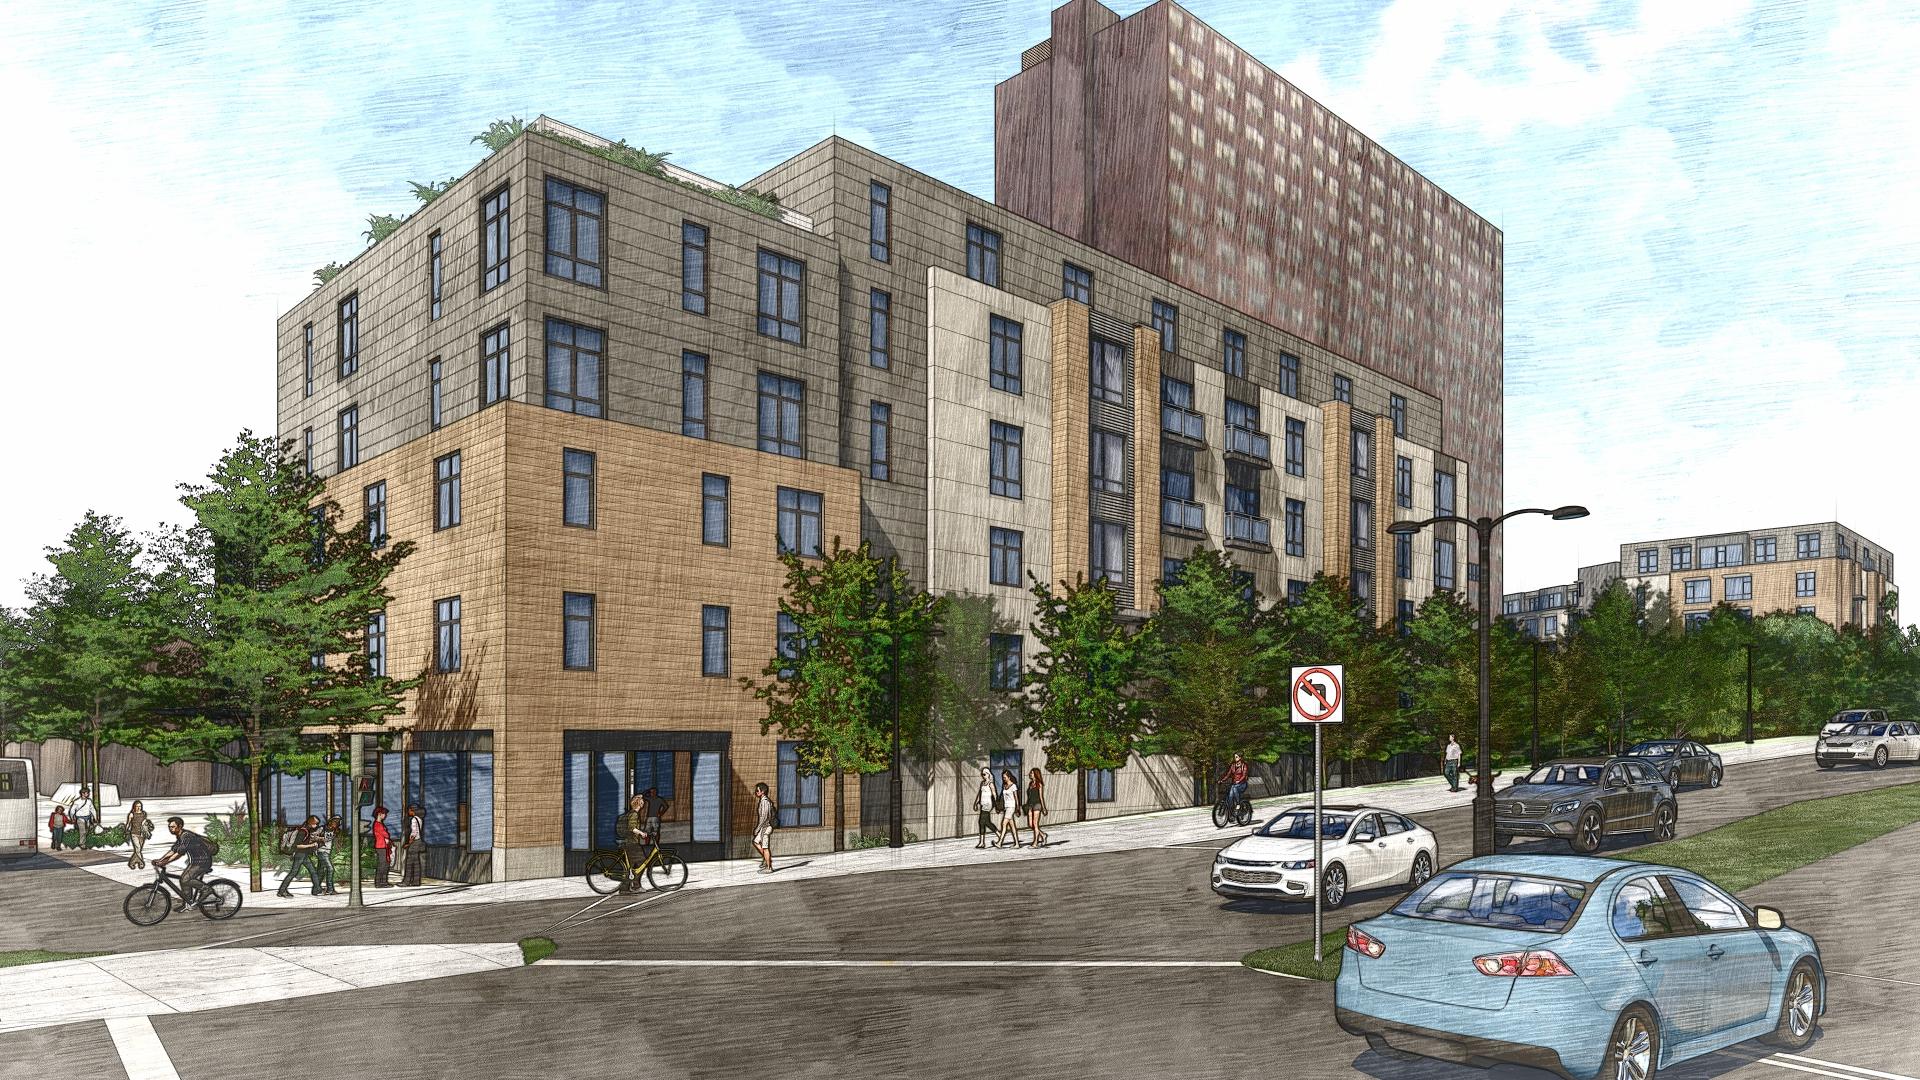 Rendering of a pair of multistory apartment buildings.